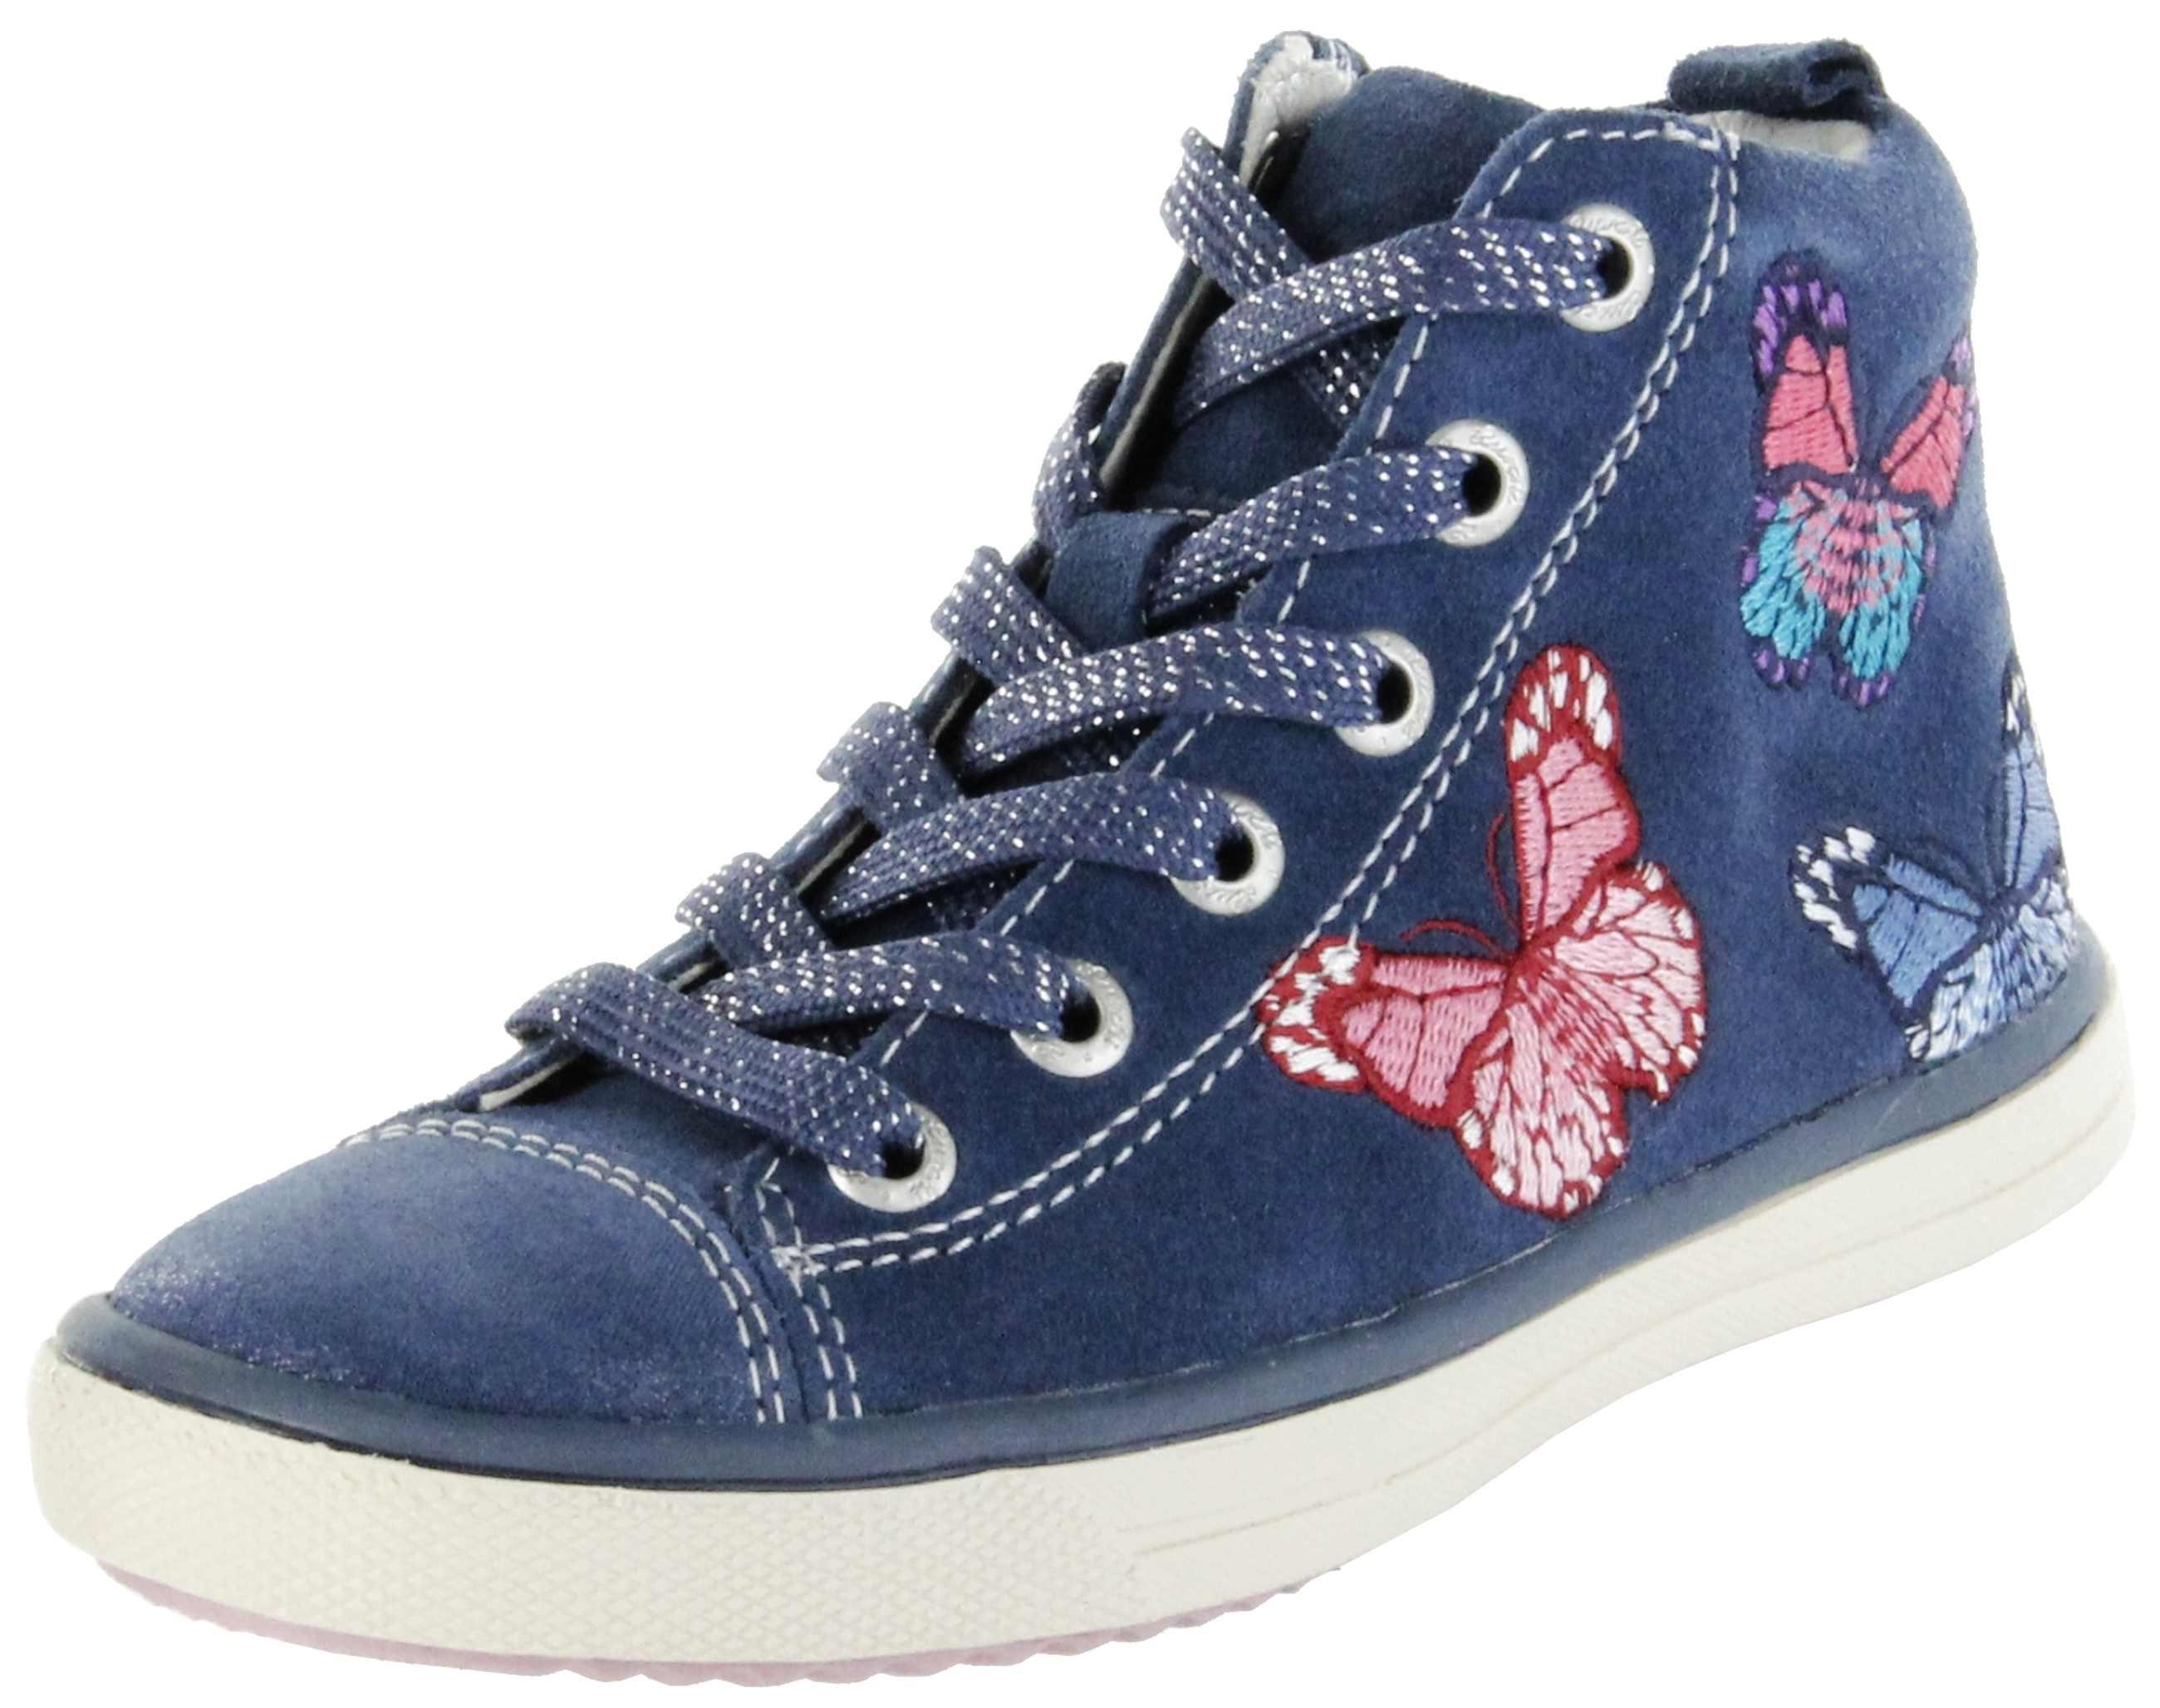 huge selection of 315a2 66dad Lurchi Kinder Halbschuhe Sneaker blau Velourleder Mädchen Schuhe  33-13639-22 Splashy